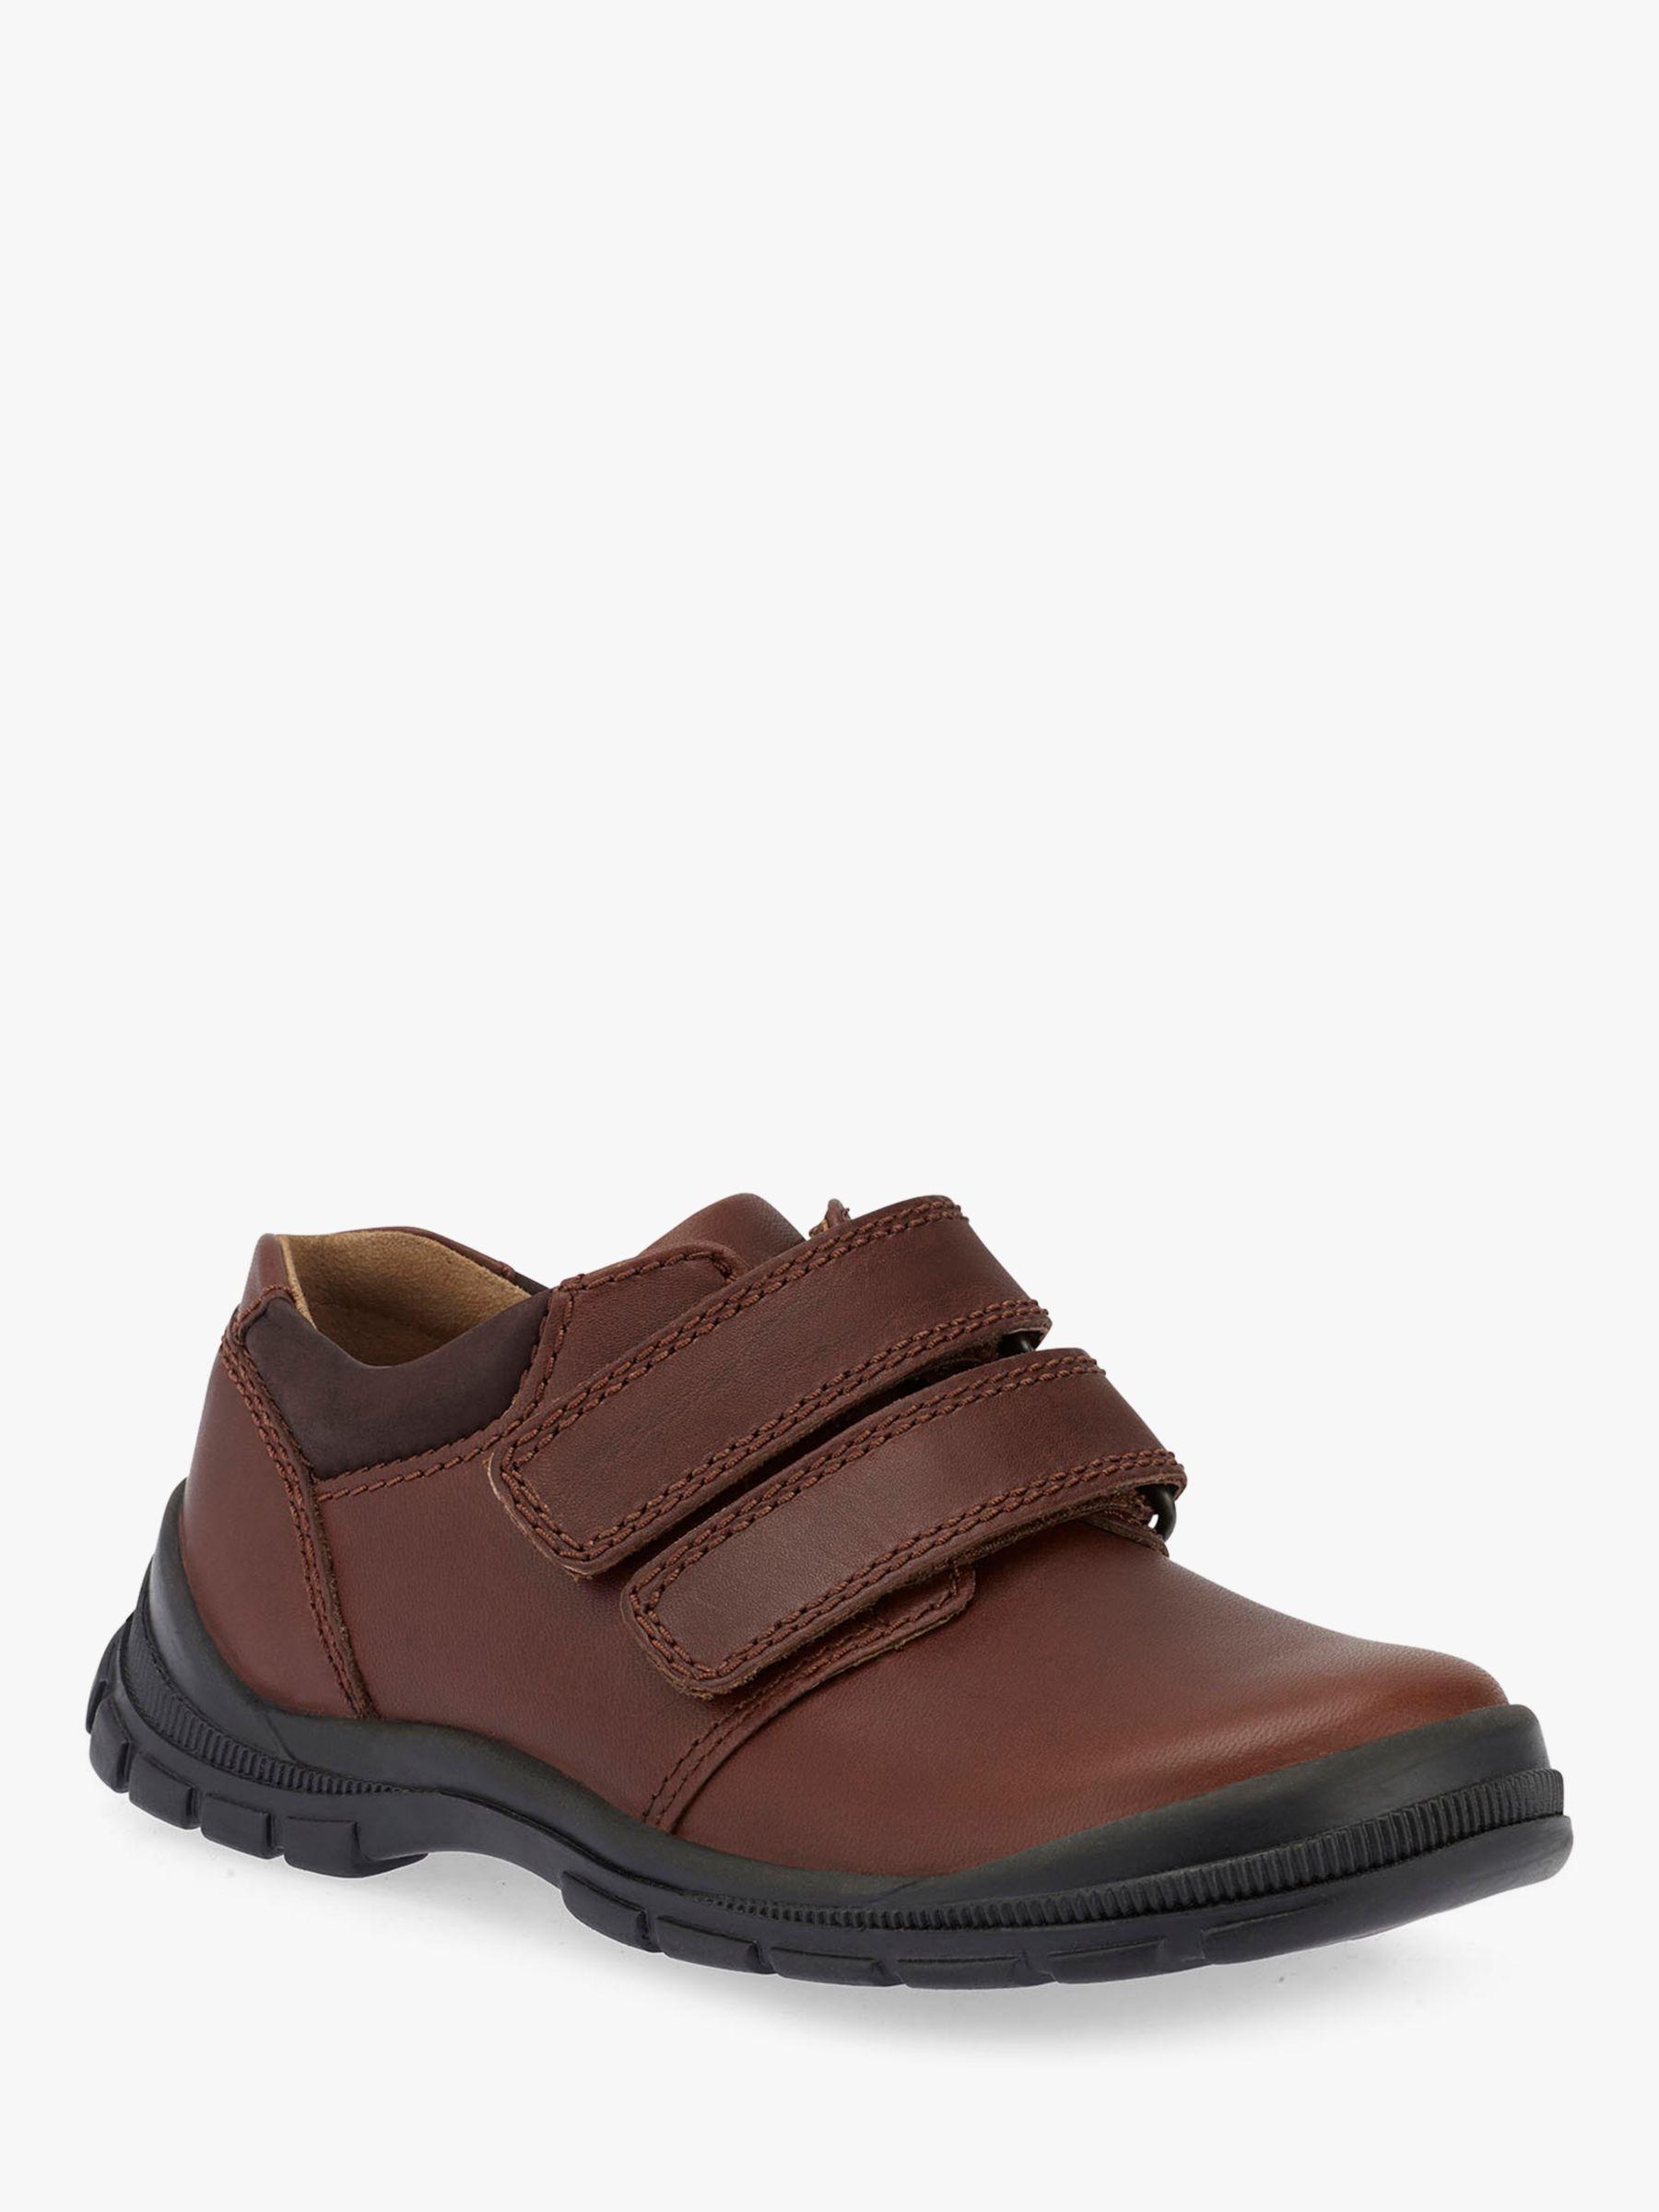 Start-Rite Start-rite Children's Engineer Leather Shoes, Brown